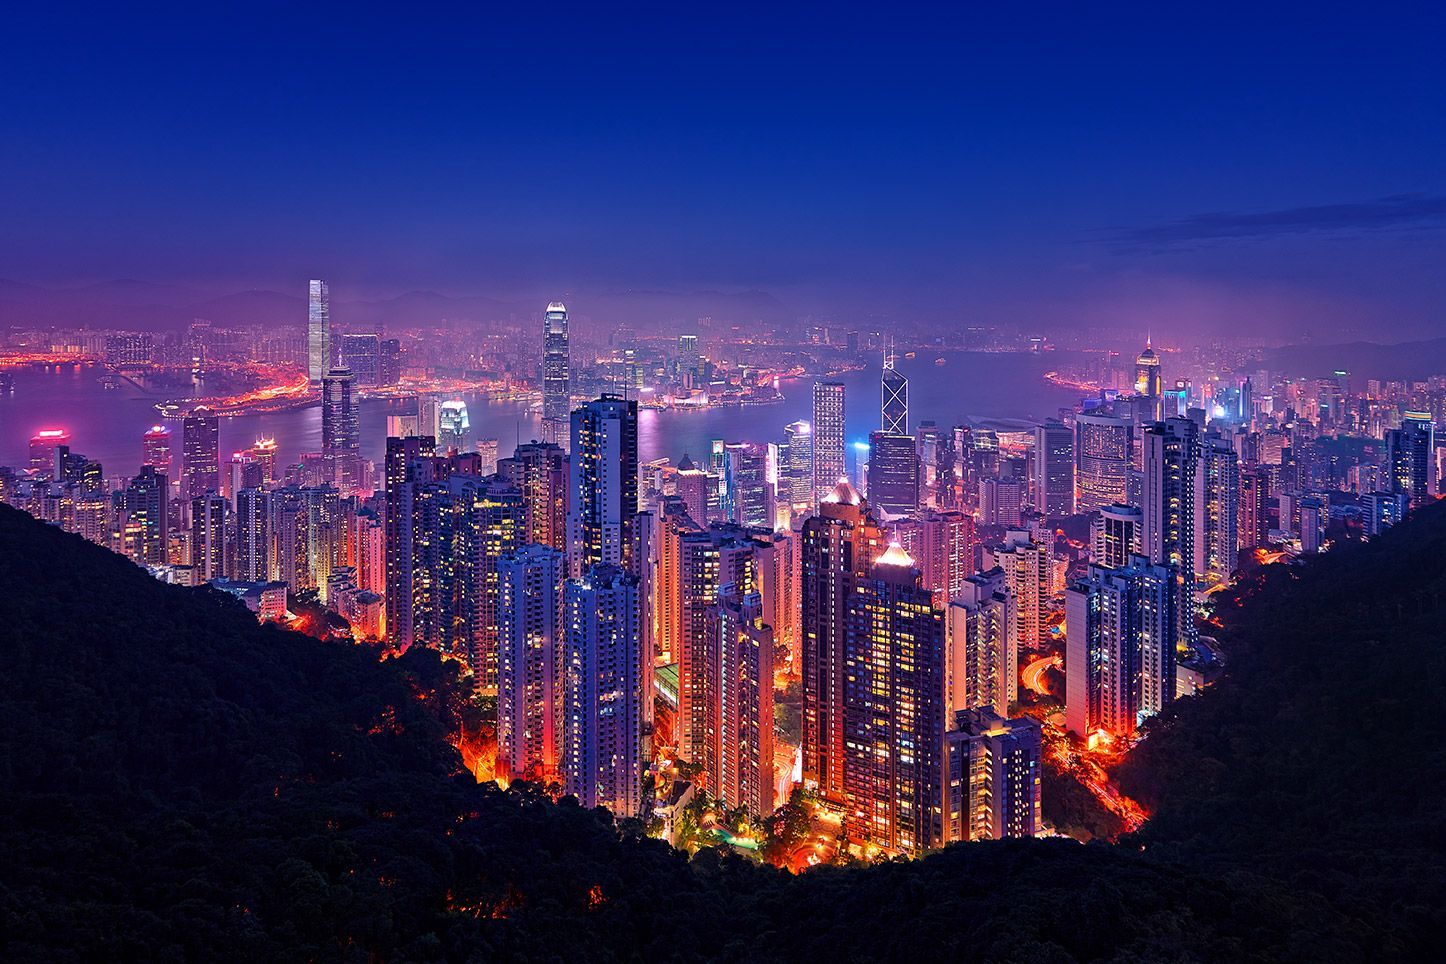 Hong Kong City Night Hongkong City Night Naturephotography Photooftheday Photograph Phototips A Cityscape Photography Landscape Photography Cityscape